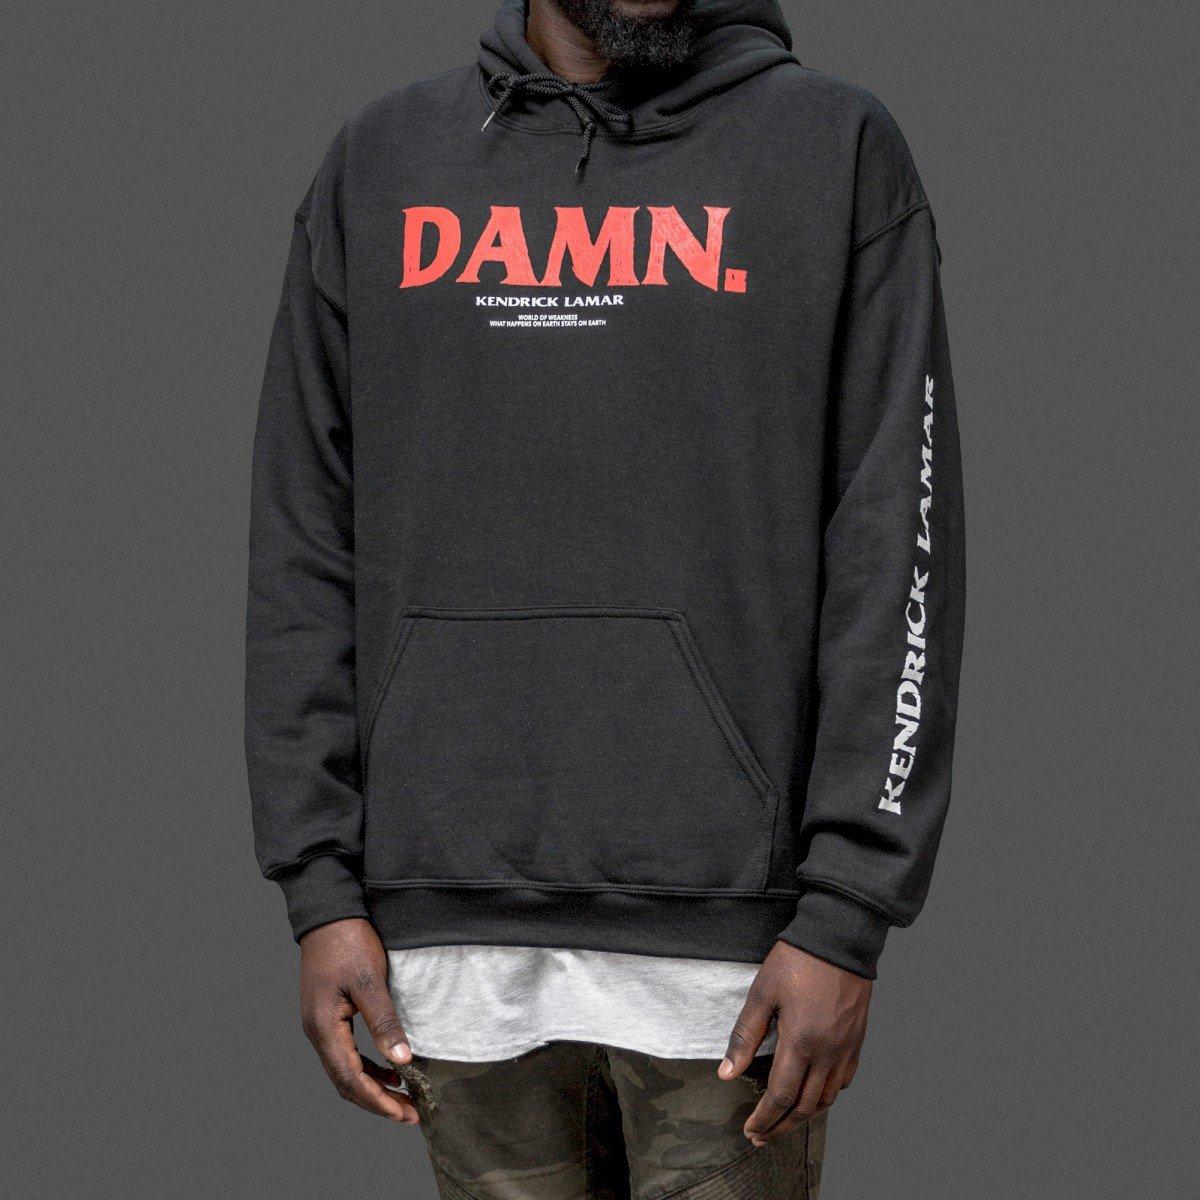 0c4c45c9 Kung Fu Kenny Damn Hoodie Hoody as Worn by Kendrick: Amazon.co.uk: Clothing